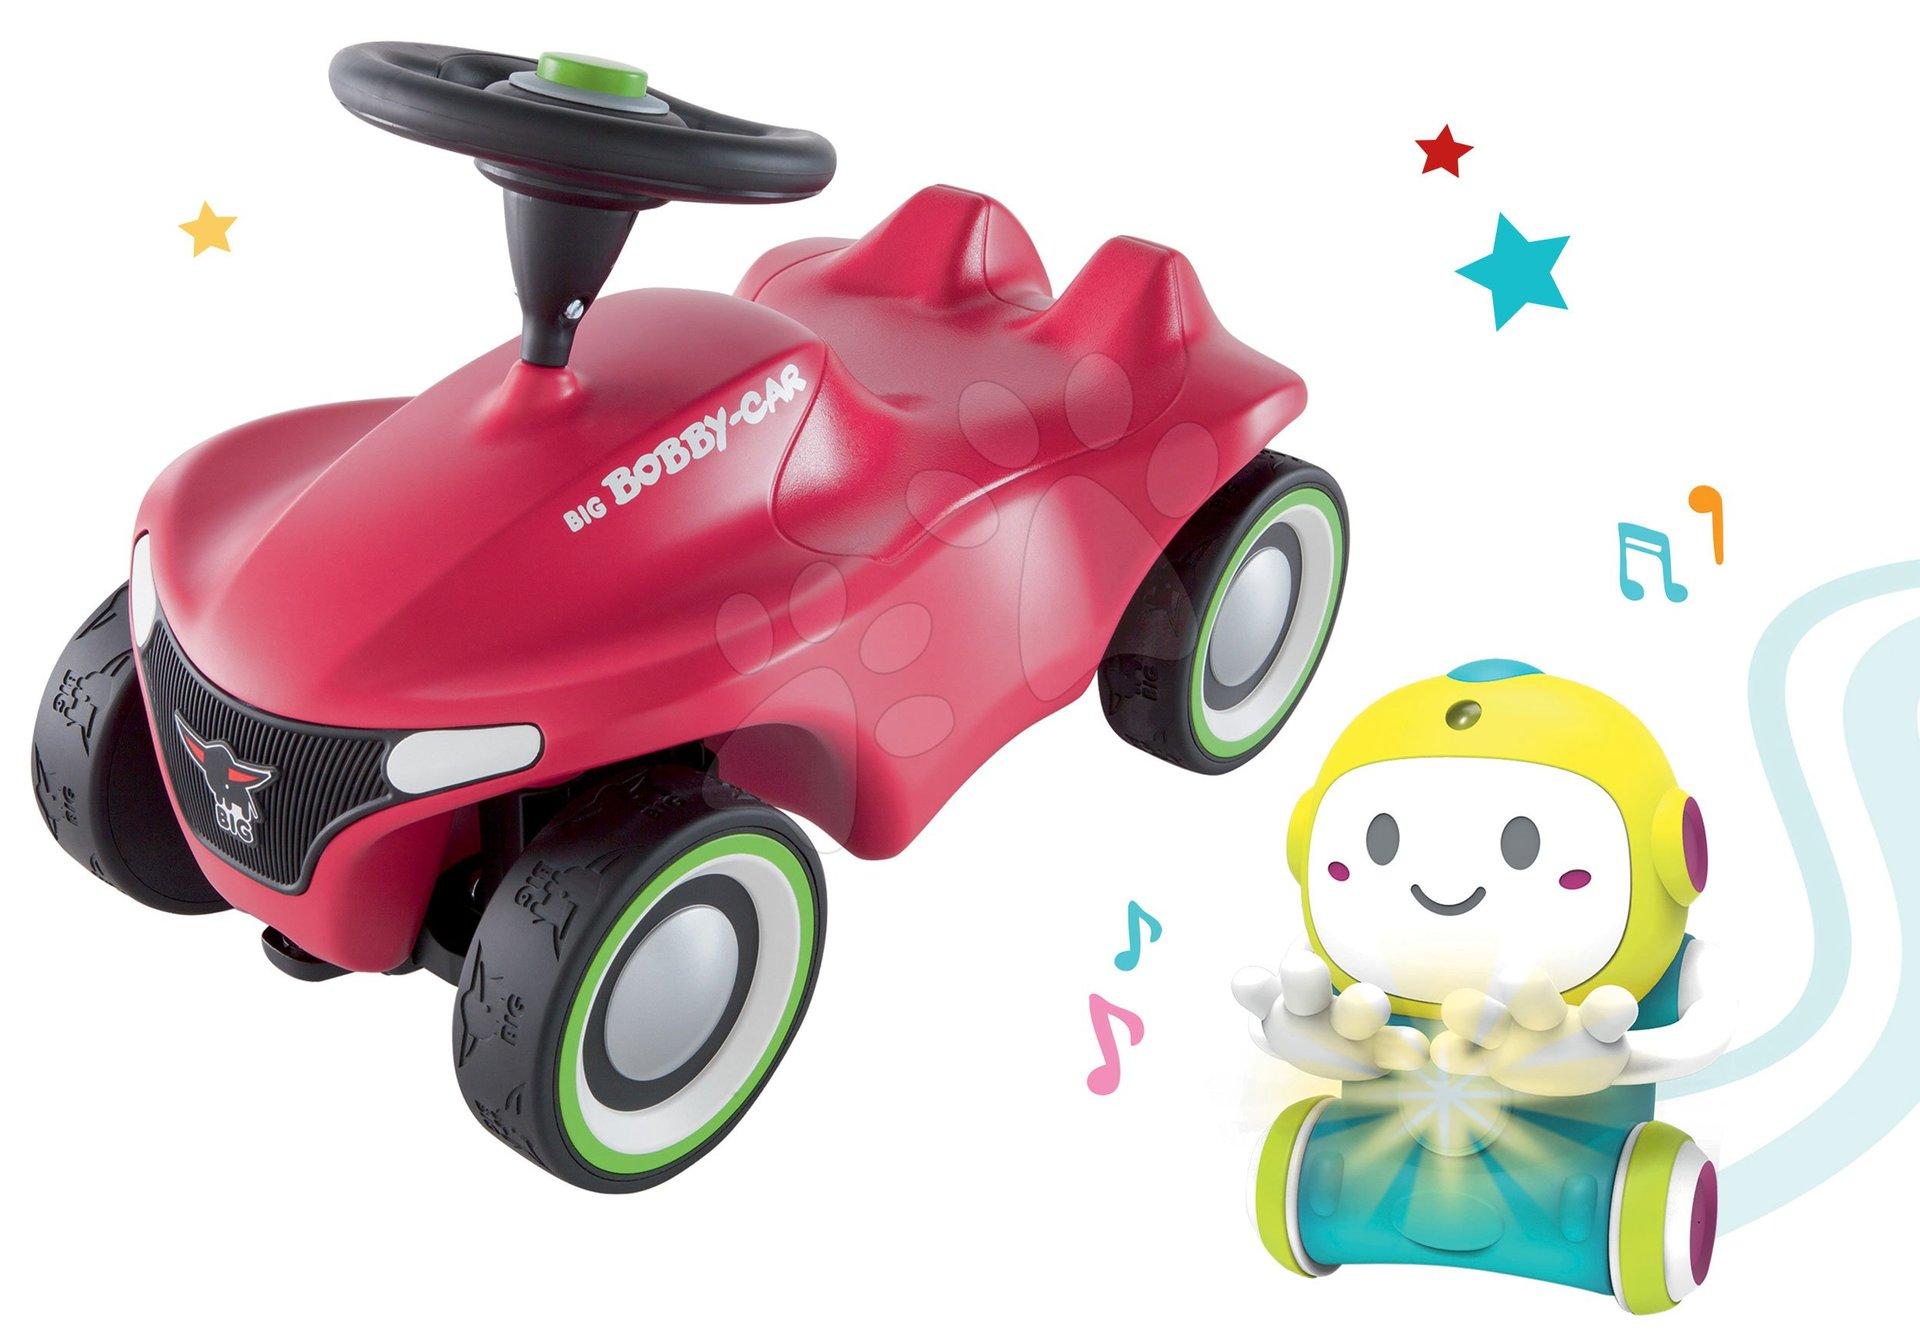 Set Interaktívny Robot 1,2,3 Smart Smoby a odrážadlo auto Bobby Car Neo Pink